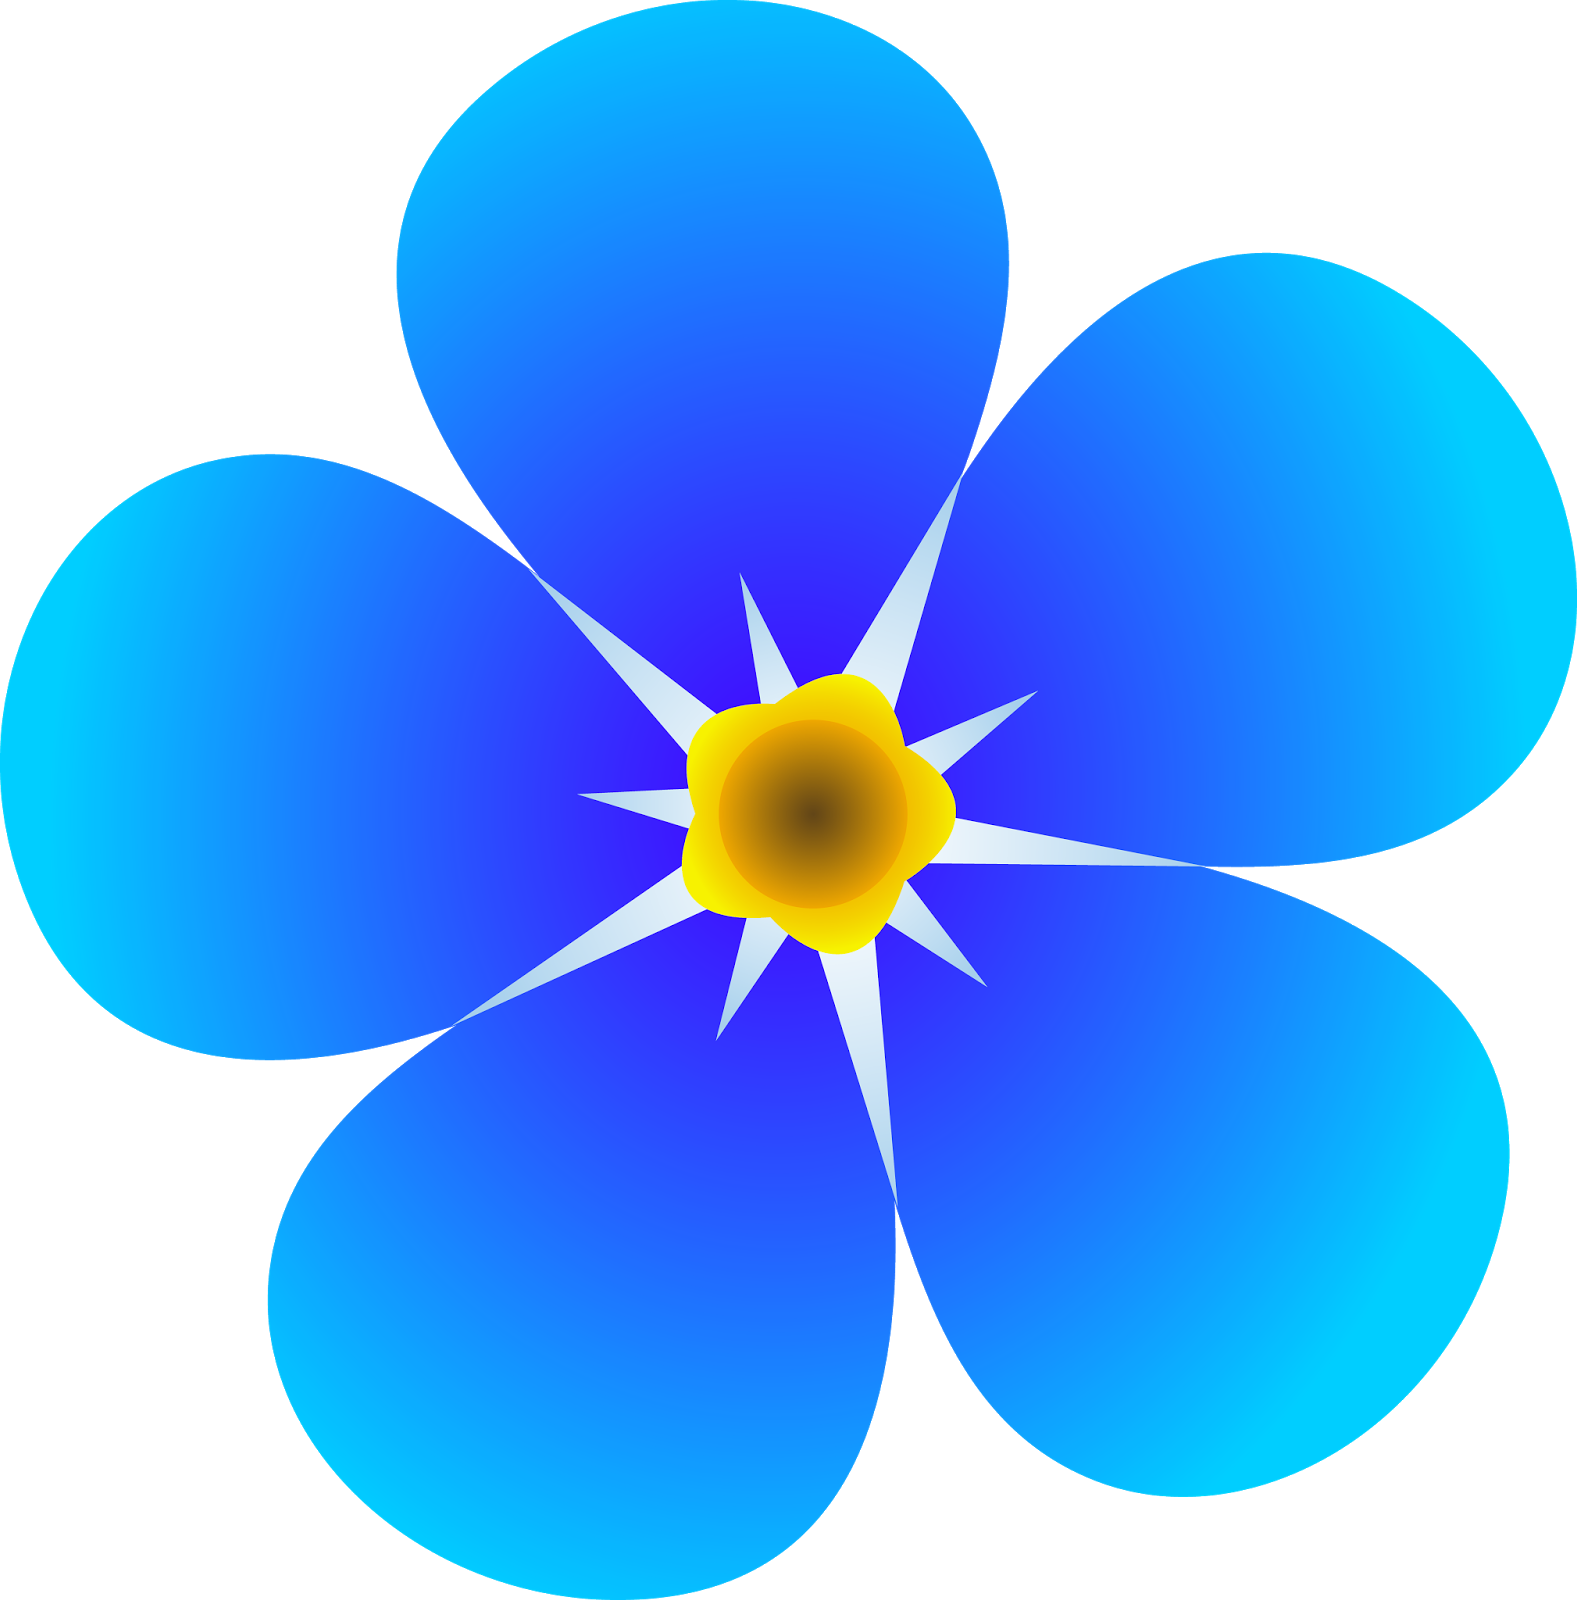 Flowers clipart spring. Flower